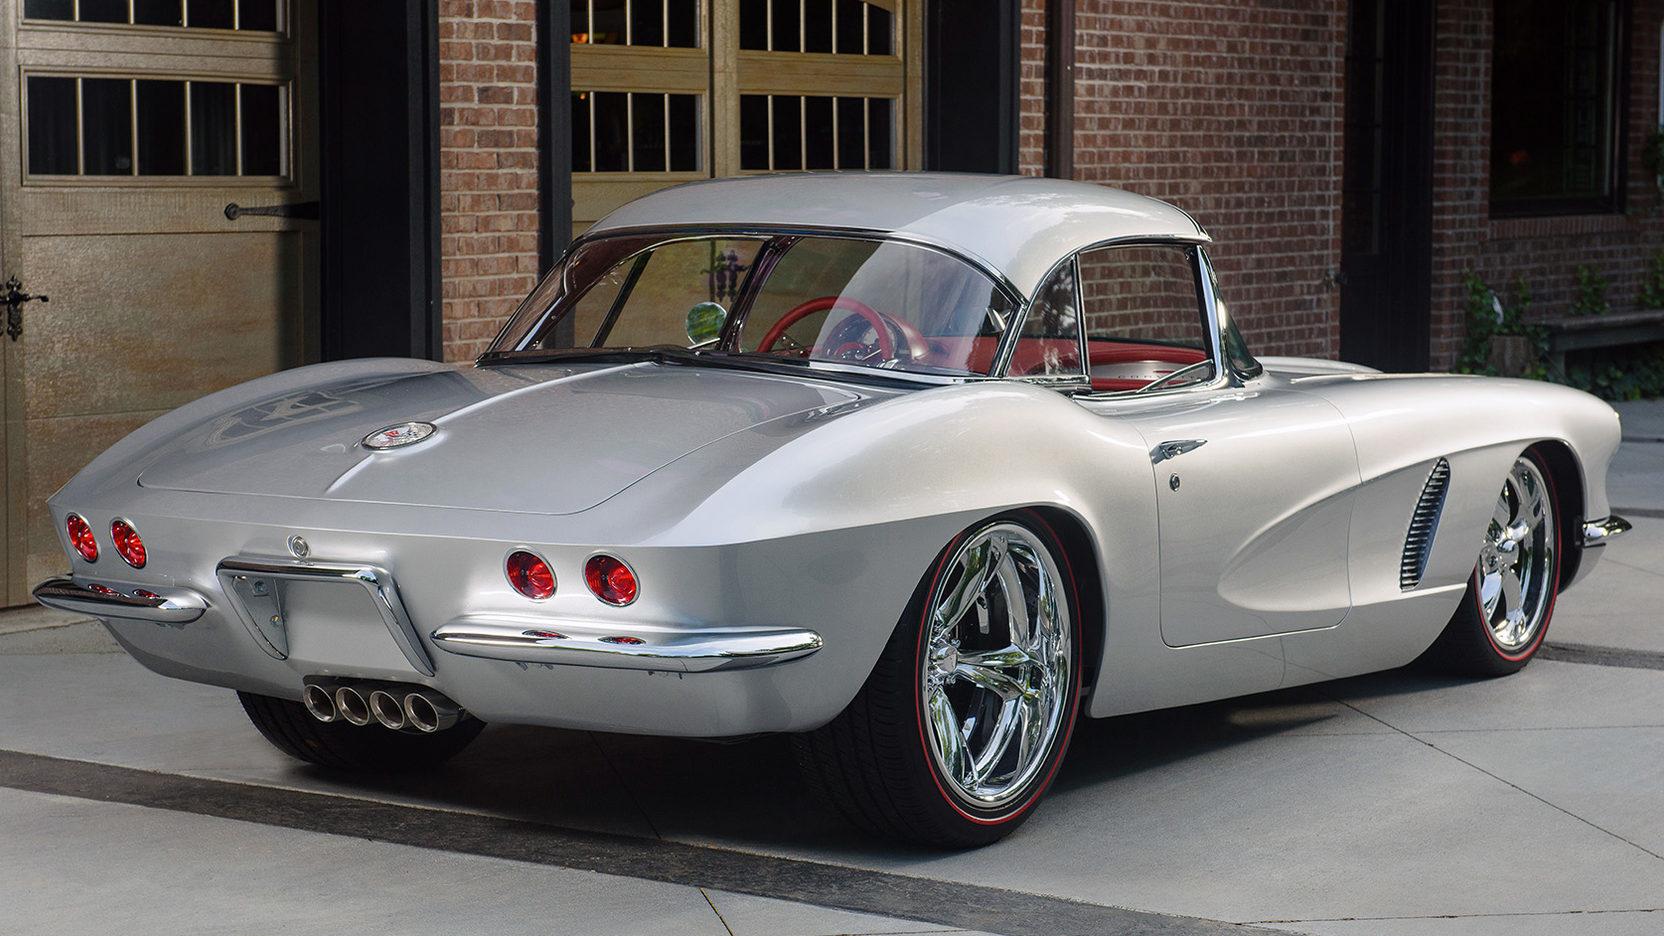 Jaw Dropper of the Week: 1962 Chevrolet Corvette LS3/500